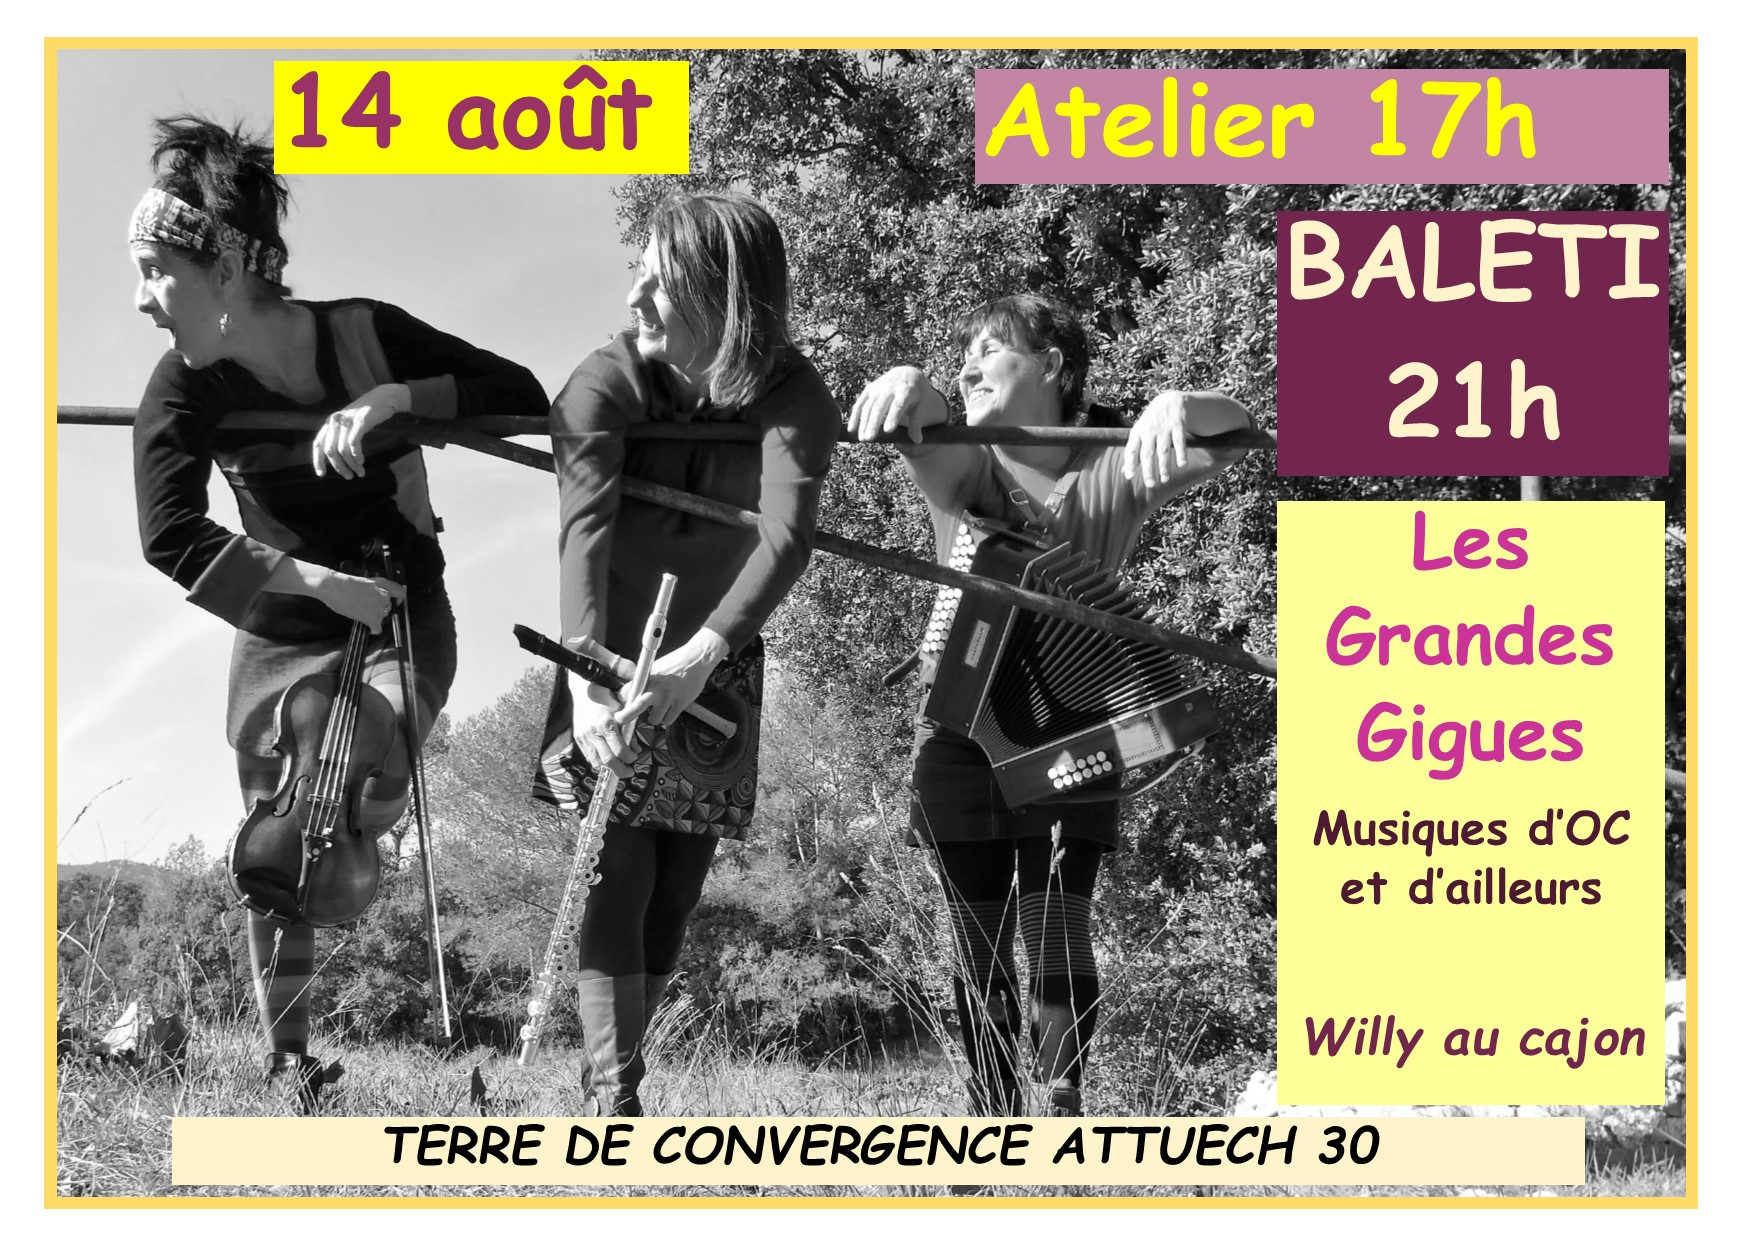 image GroupeLesGrandesGiguesBaletiCurtiIsabel_bf_documentjoint_attuech.jpg (0.6MB) Lien vers: https://www.facebook.com/Grandesgigues/